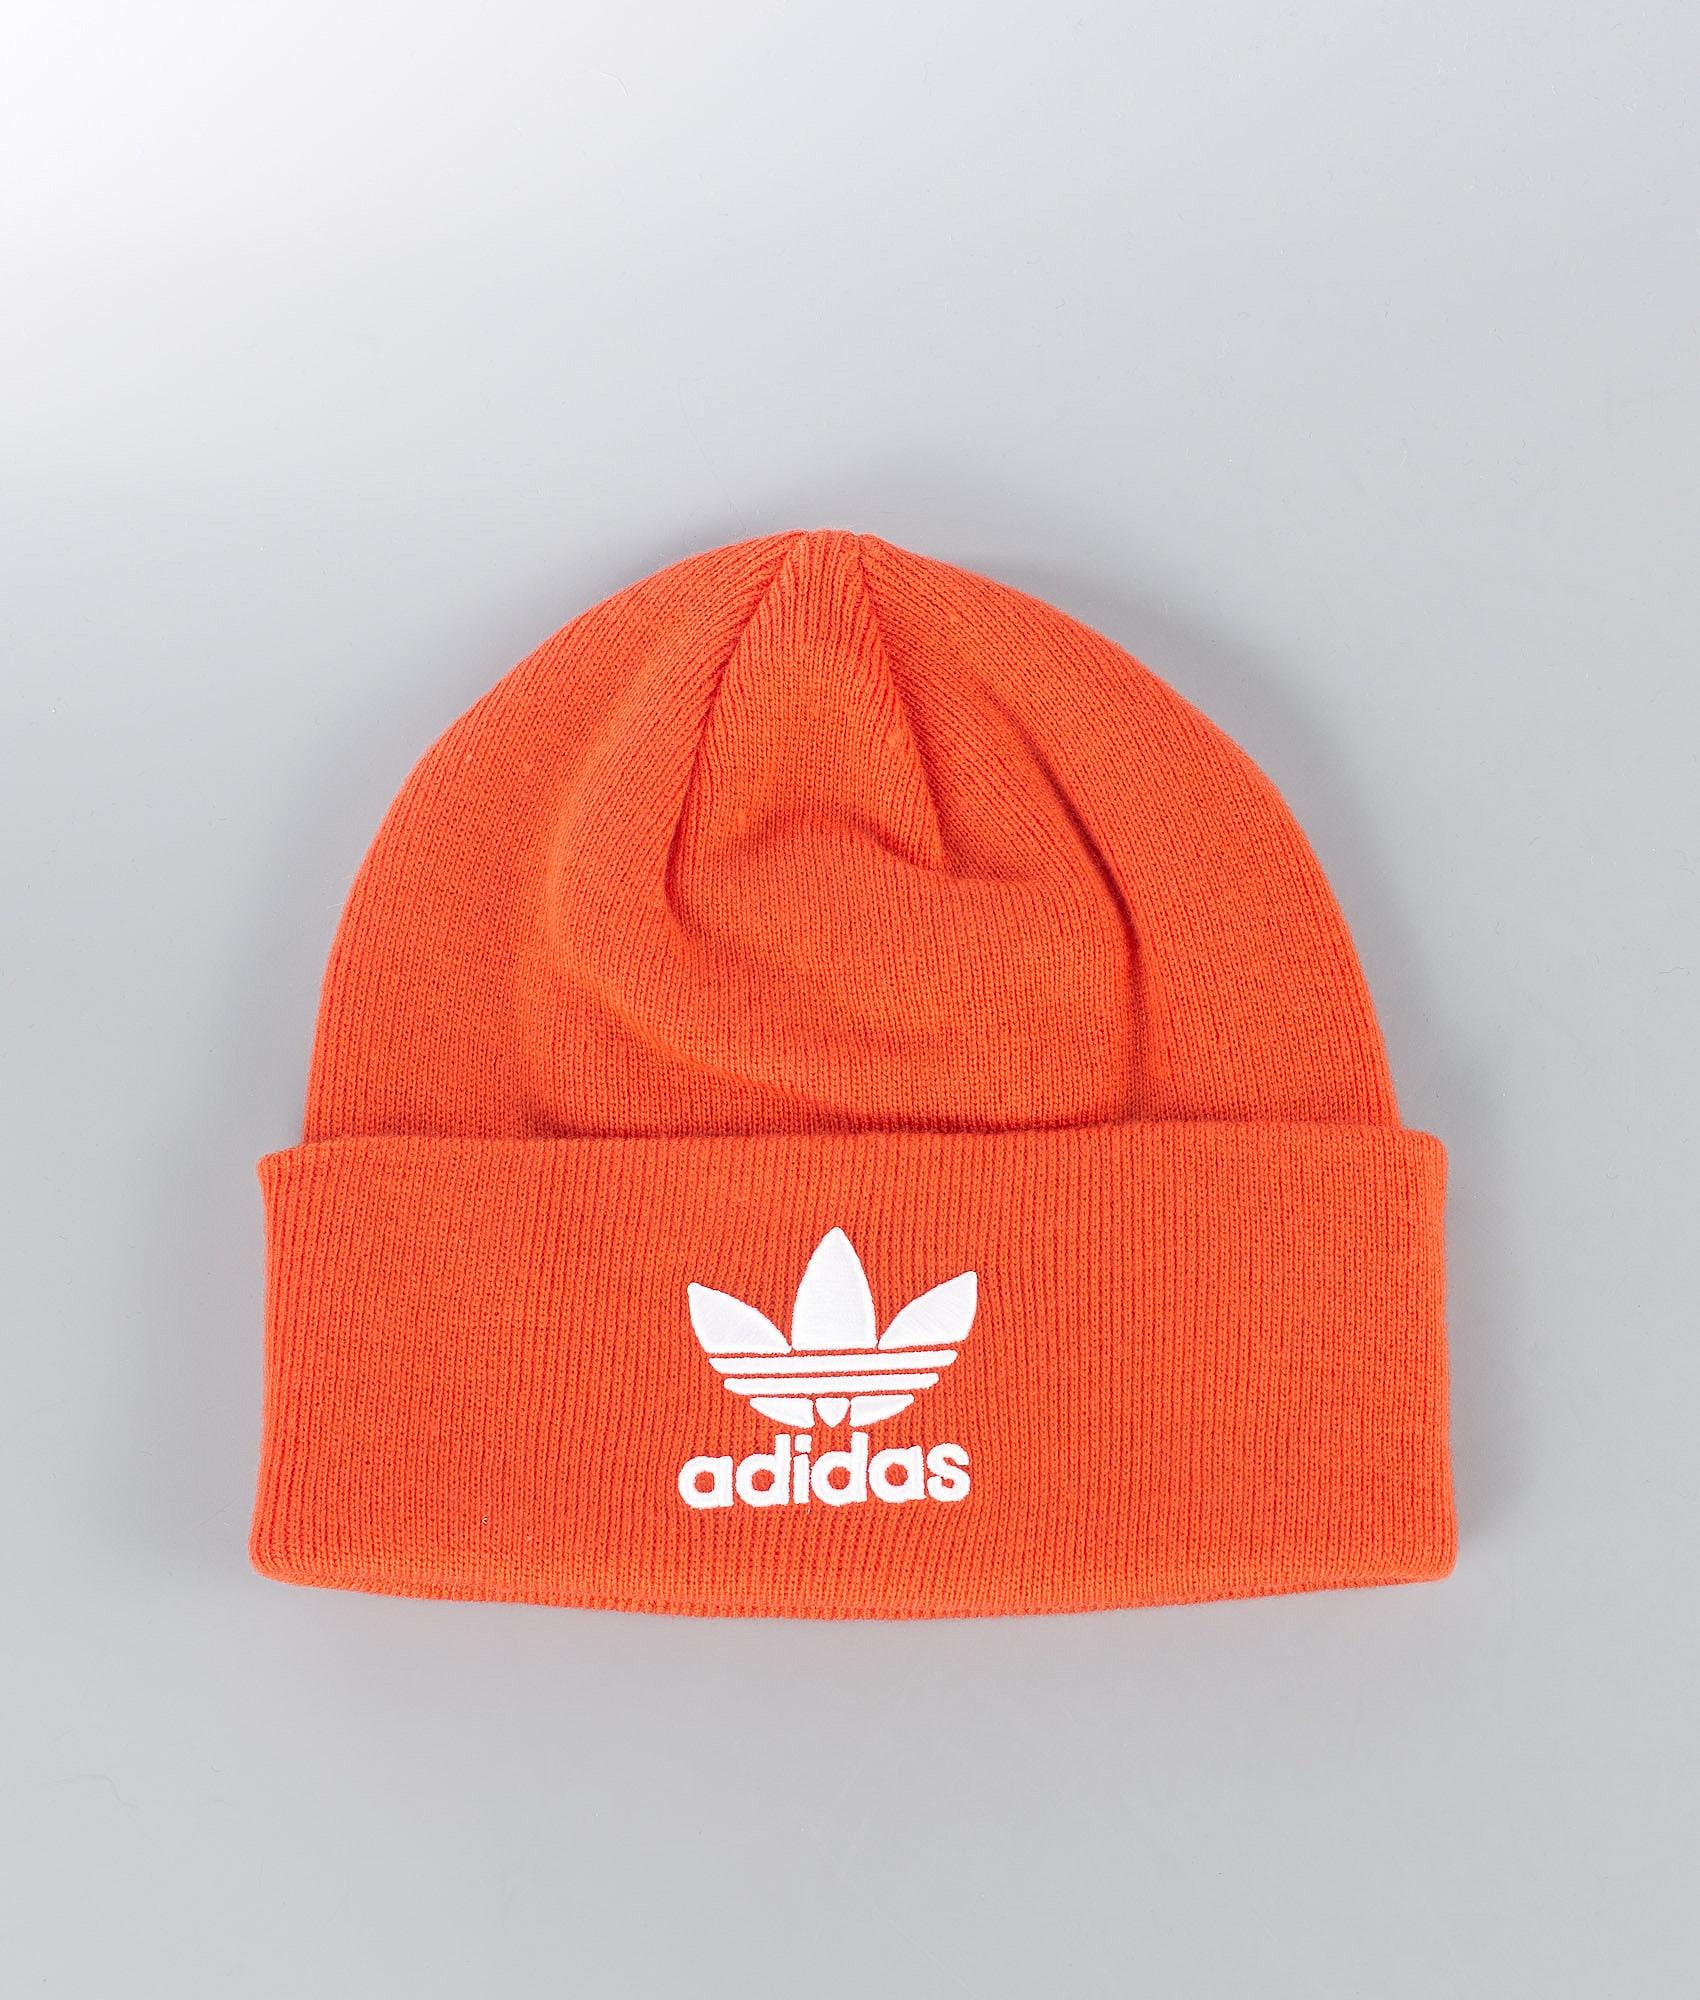 Adidas Originals Trefoil Berretto Raw Amber - Ridestore.it 68016c88183a